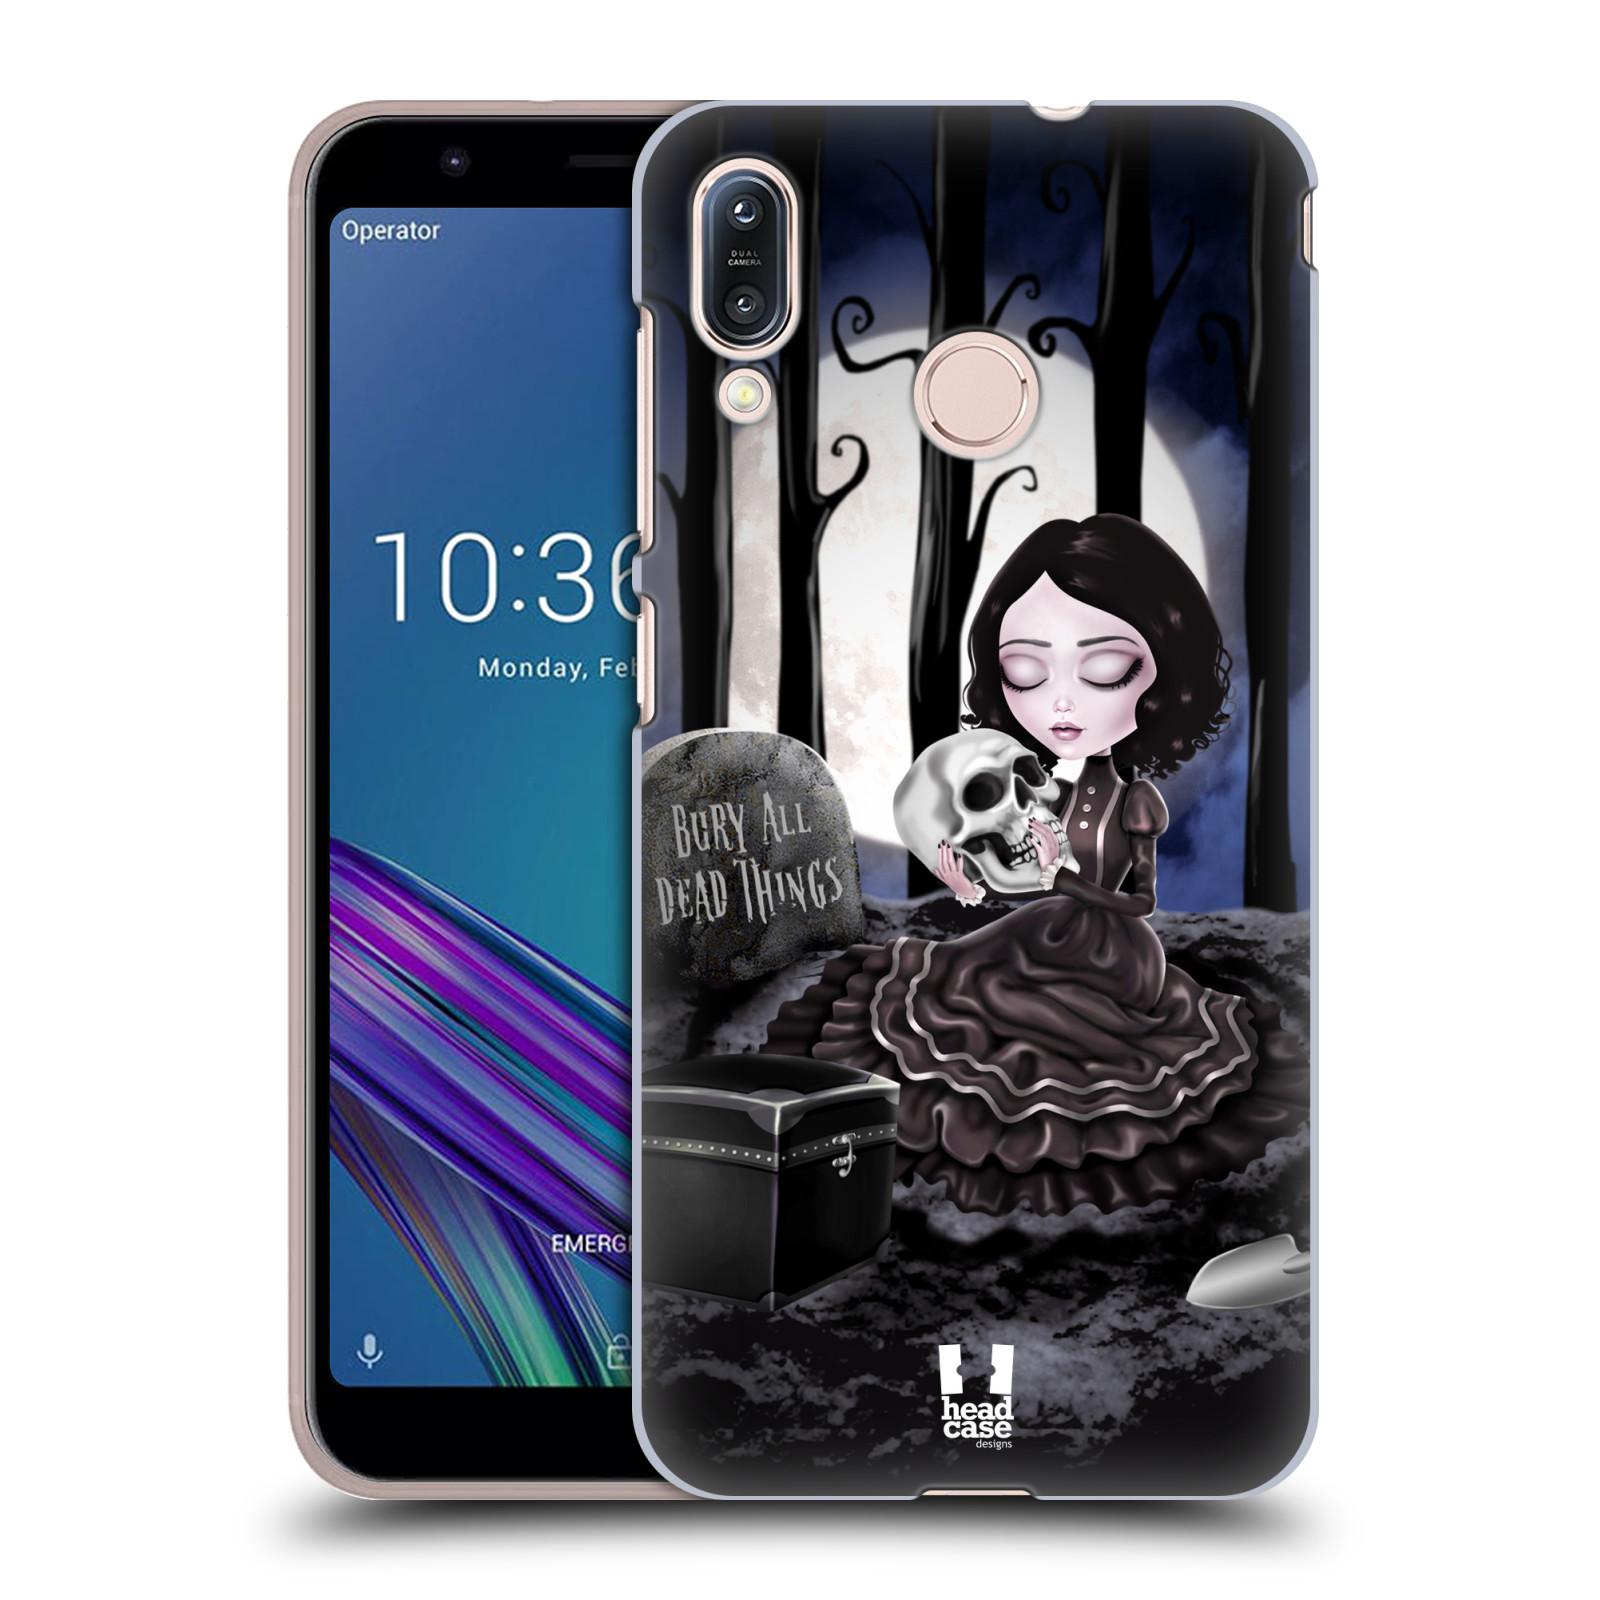 Plastové pouzdro na mobil Asus Zenfone Max M1 ZB555KL - Head Case - MACABRE HŘBITOV